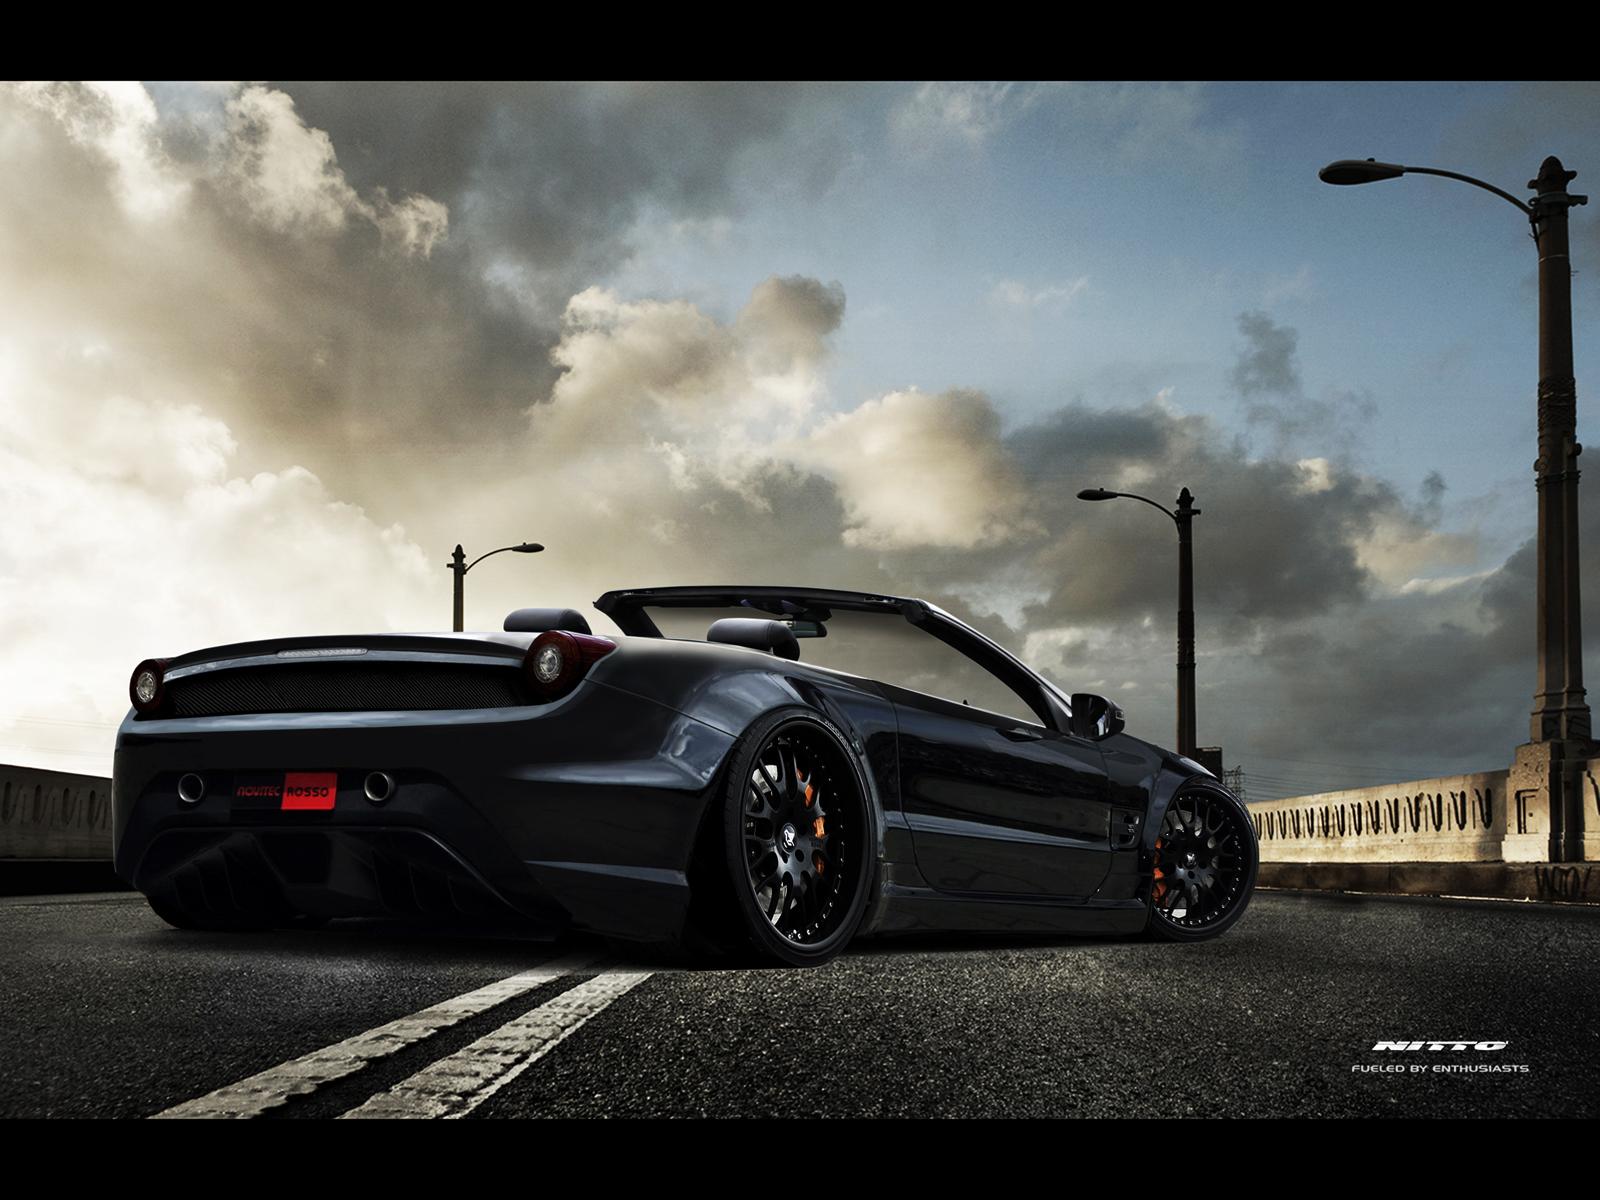 marko_0811's Profile › Autemo.com › Automotive Design Studio